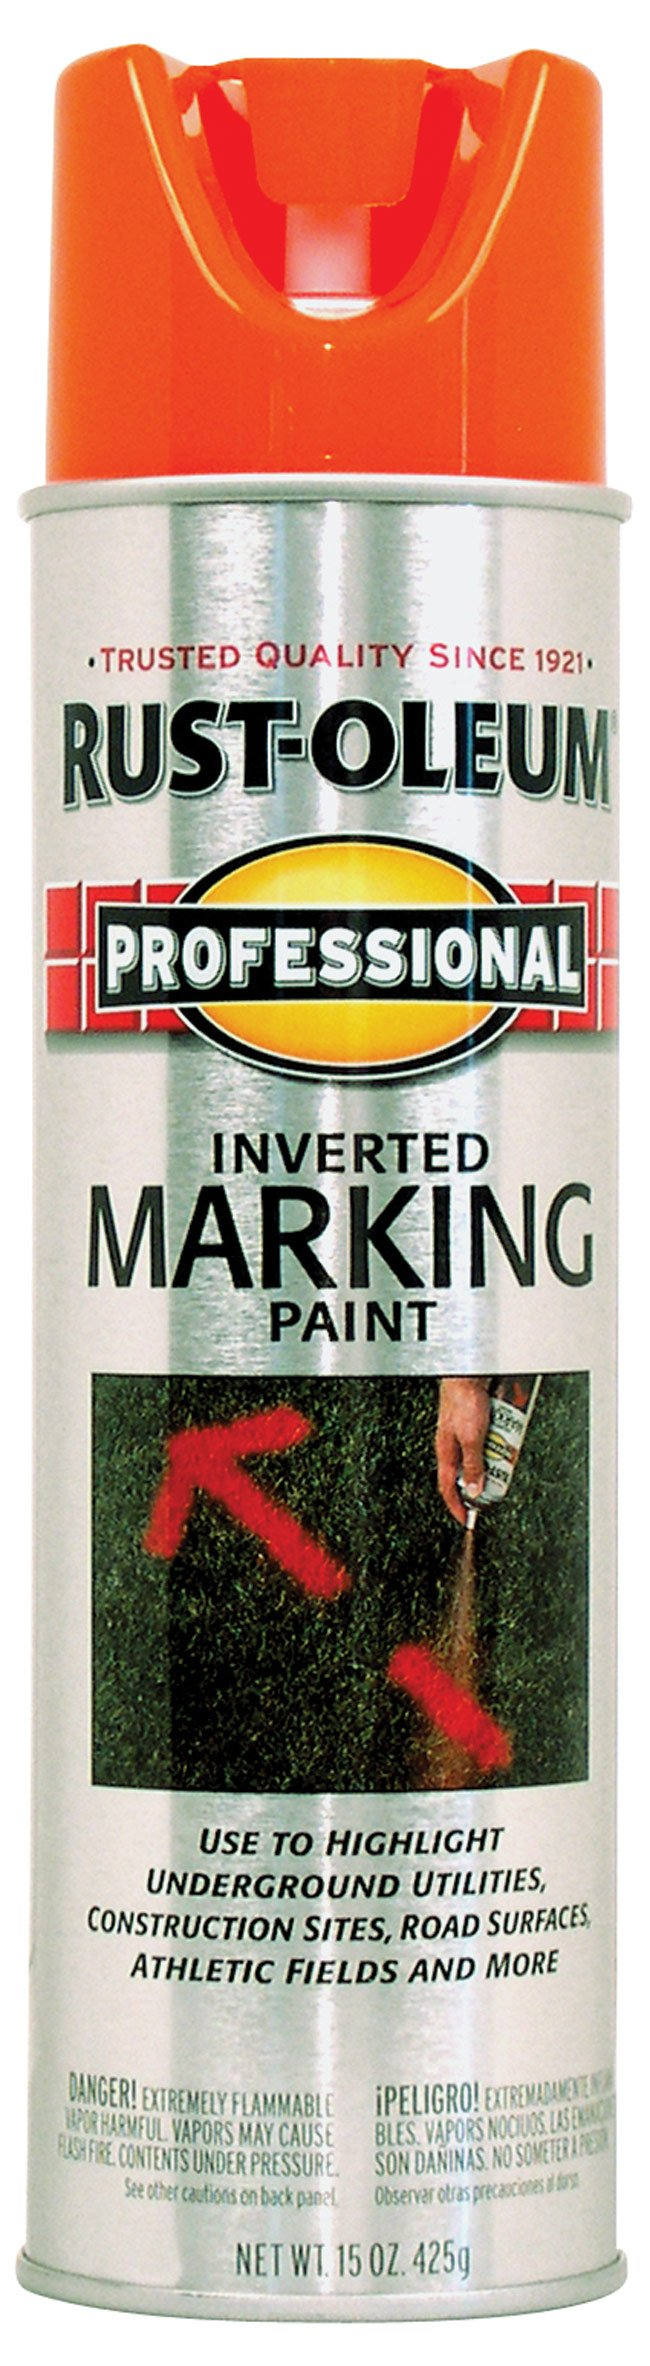 Rust-Oleum 2554 Professional Inverted Marking Spray Paint, Fluorescent Orange, 15-Ounce